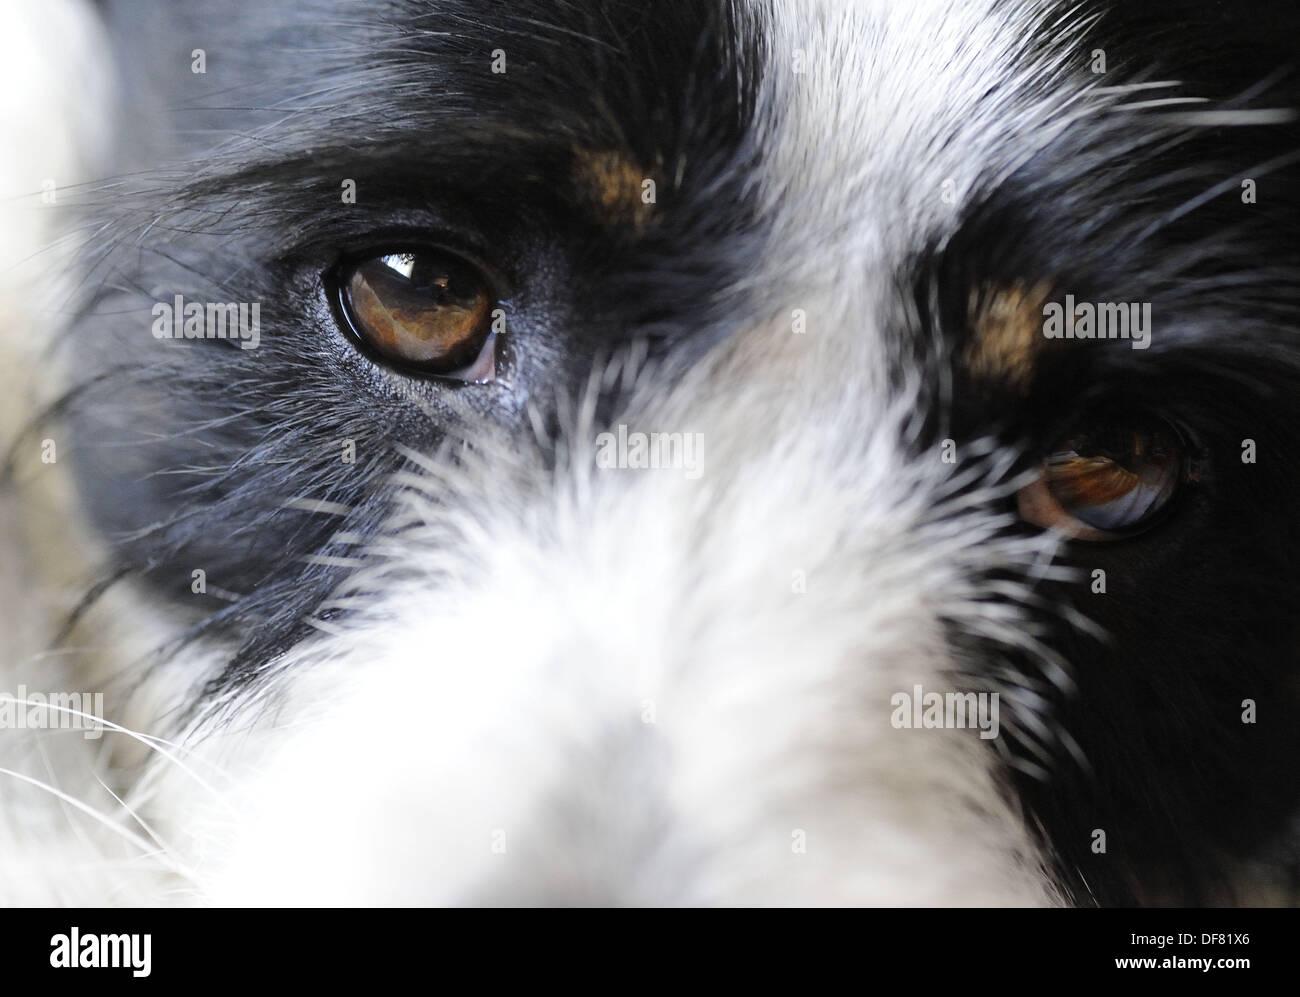 Terrier Mix Stockfotos & Terrier Mix Bilder - Alamy